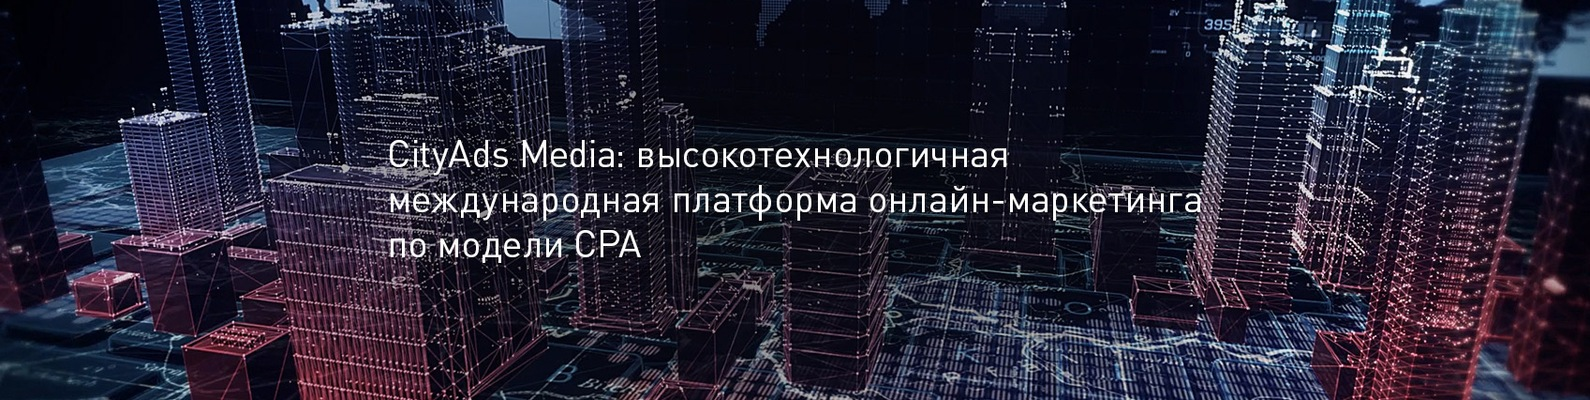 66751602e CityAds: клуб вебмастеров | ВКонтакте